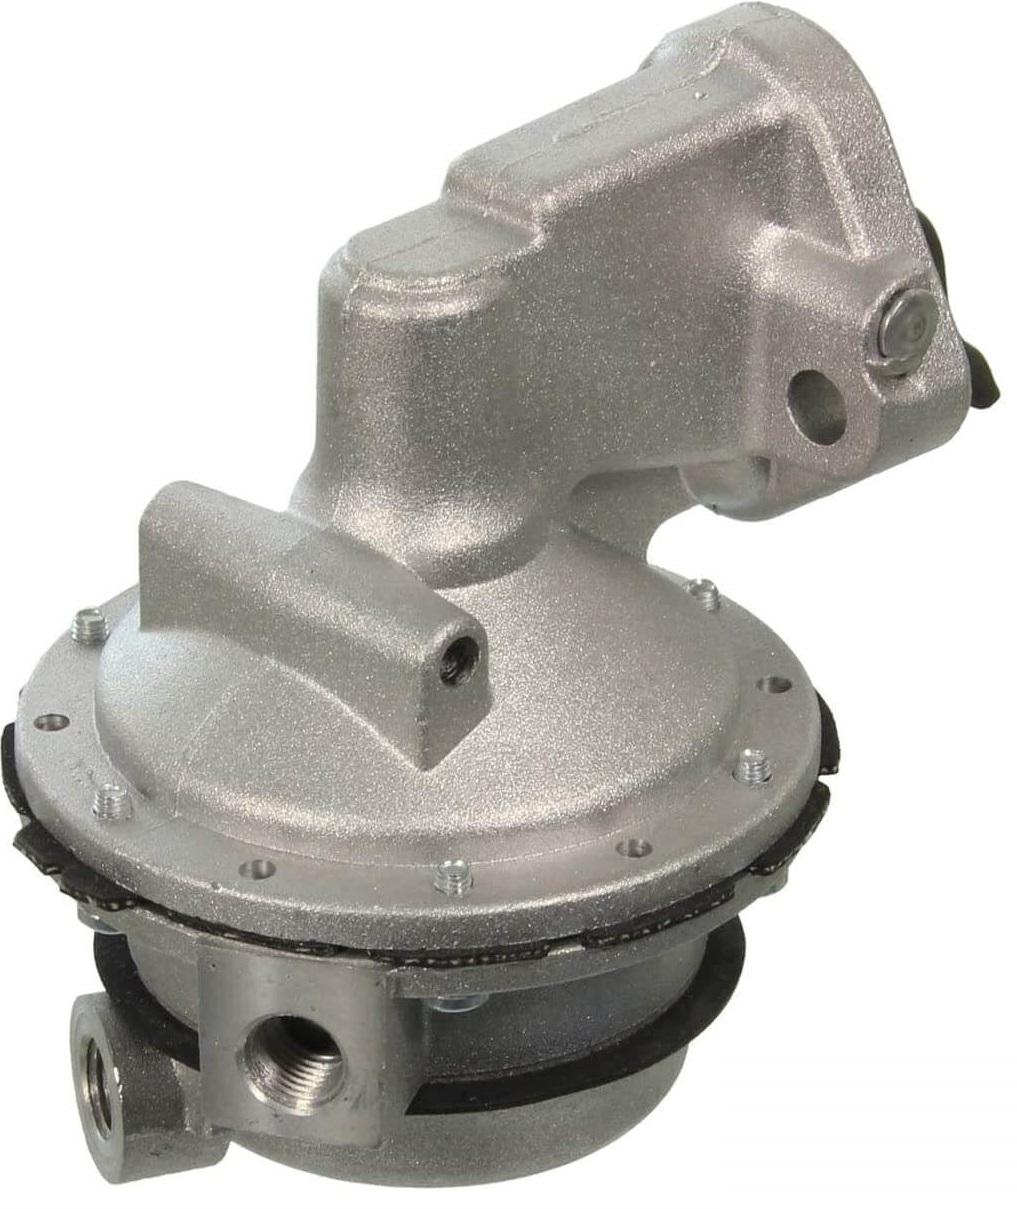 Brand Carter Mechanical Fuel Pump – Copy